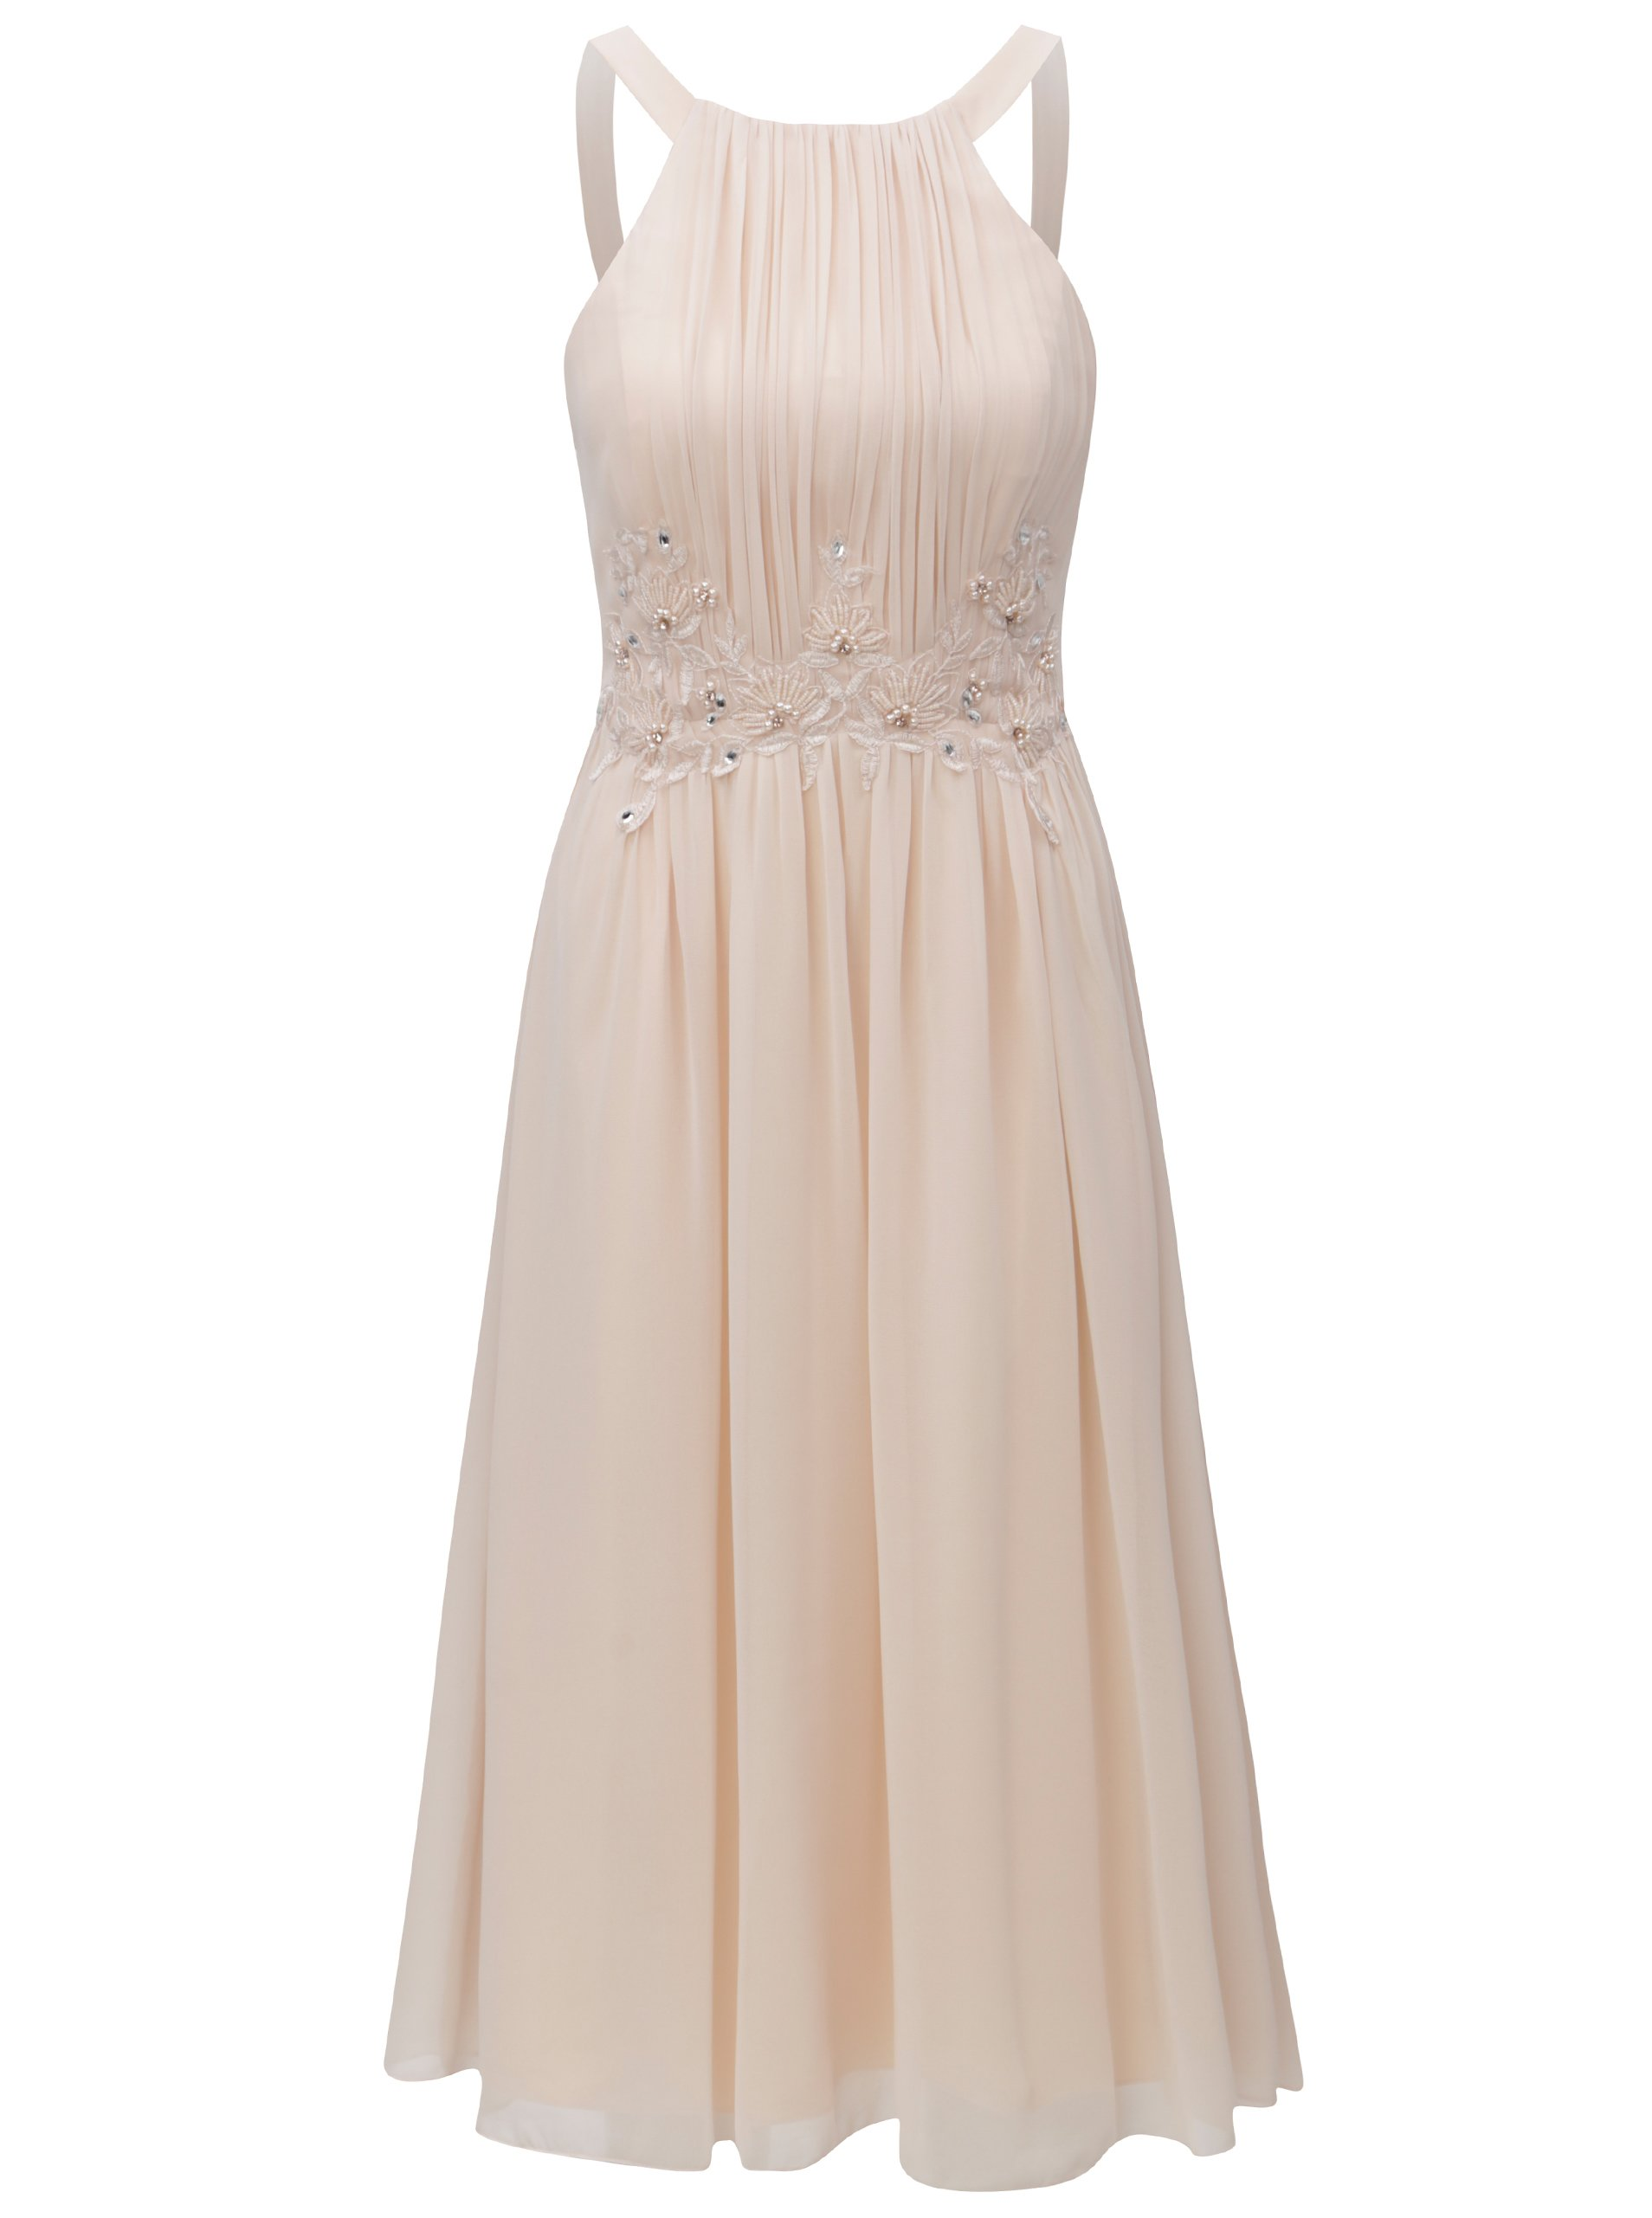 03440f24c90b Marhuľové šaty s korálkami Little Mistress